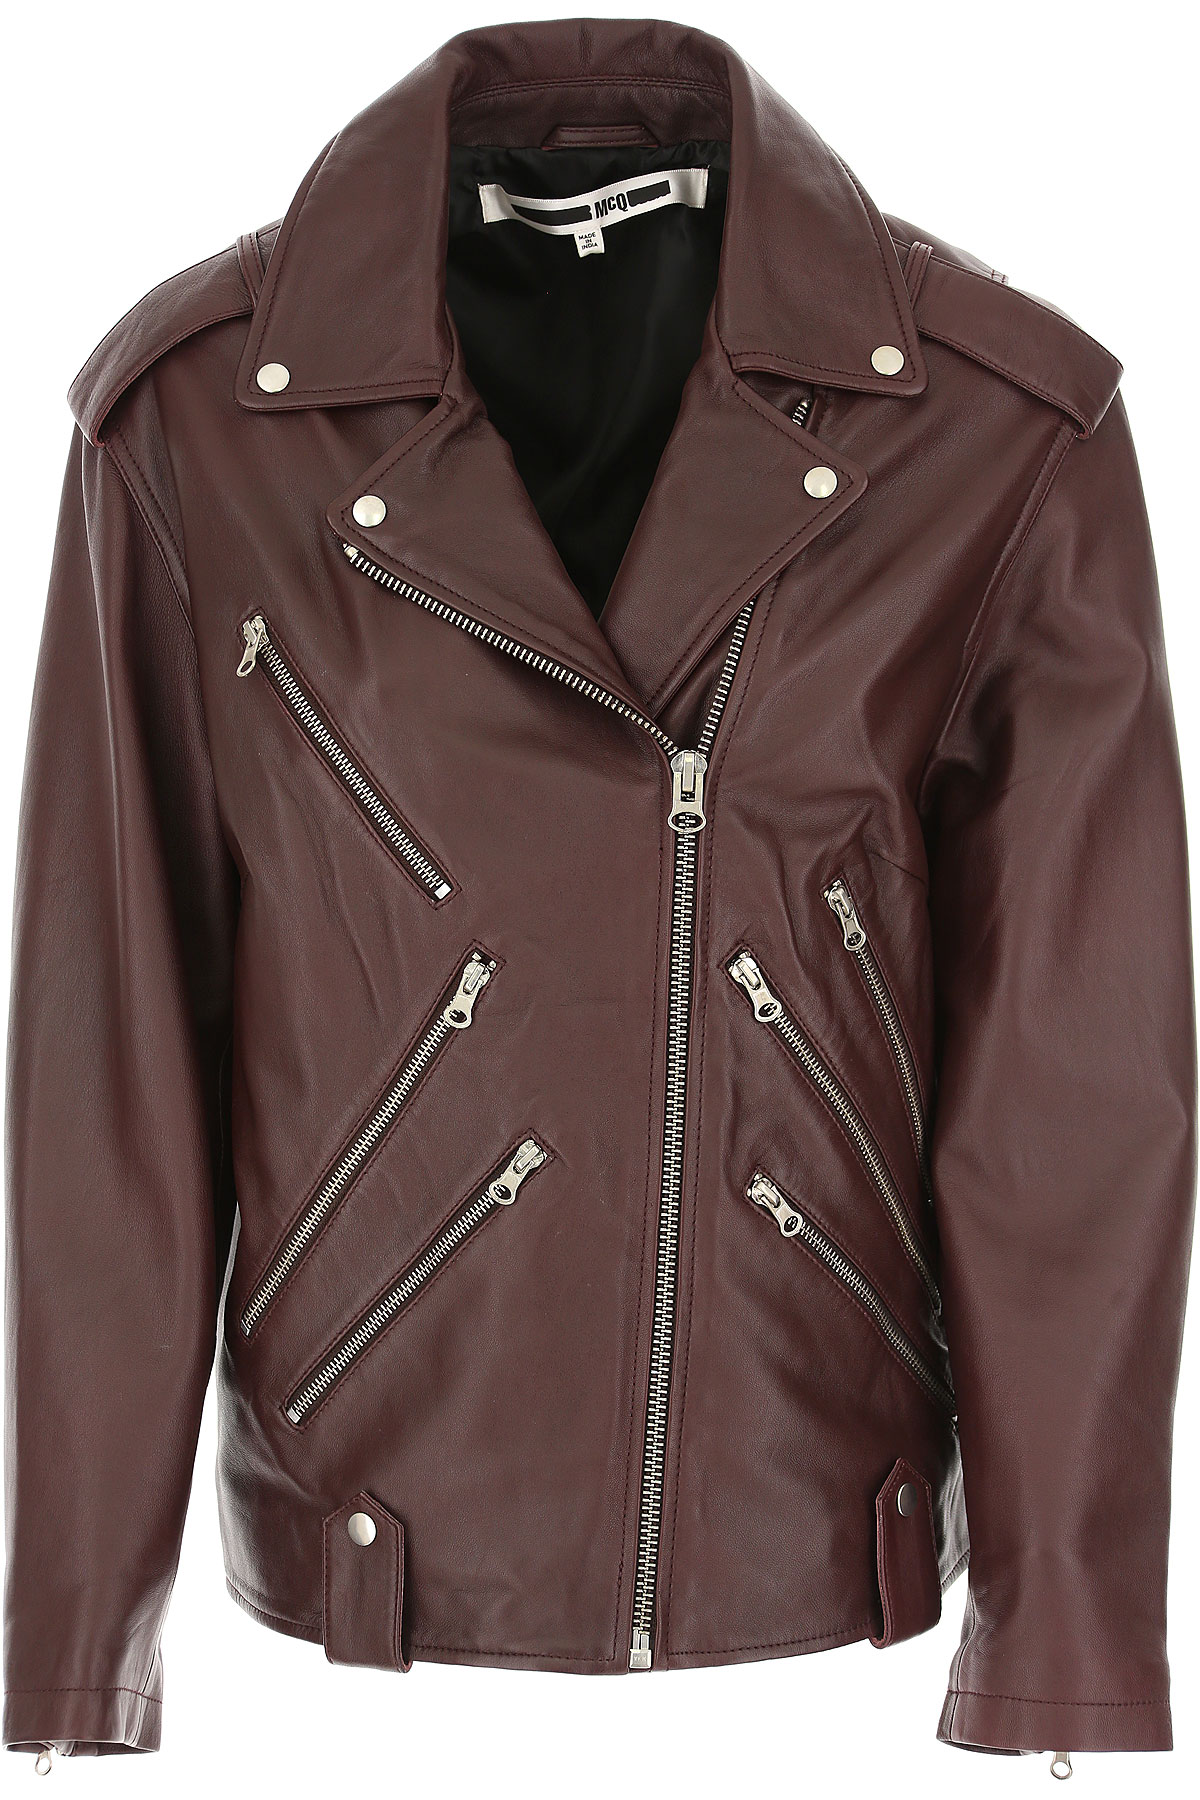 Image of Alexander McQueen McQ Leather Jacket for Women, Bordeaux, Leather, 2017, UK 6 - US 4 - EU 38 UK 8 - US 6 - EU 40 UK 10 - US 8 - EU 42 UK 12 - US 10 - EU 44